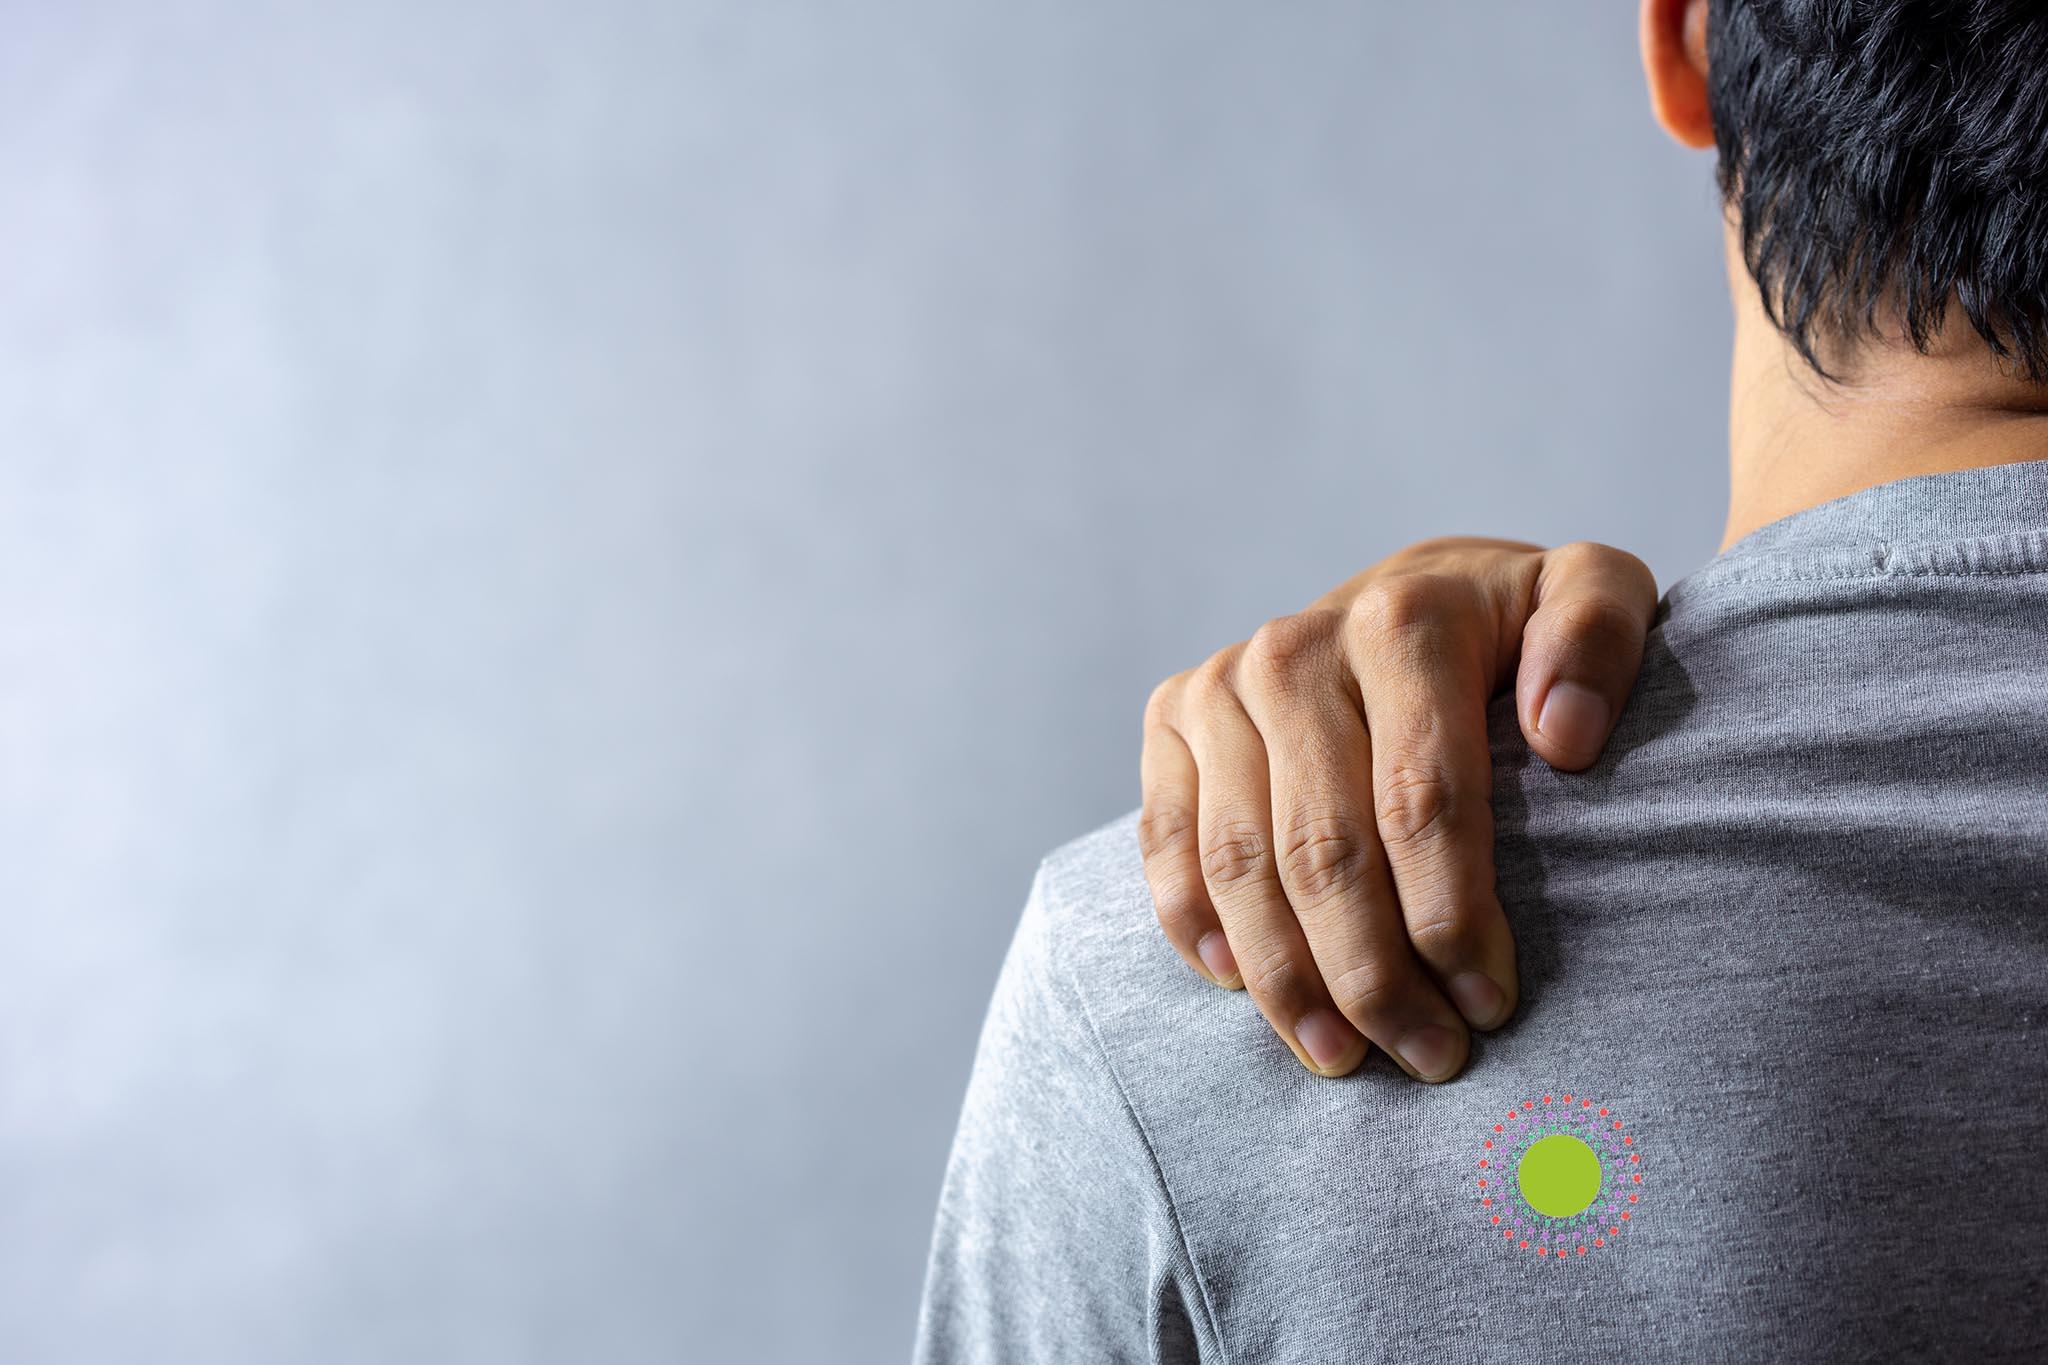 comra shoulder pain image